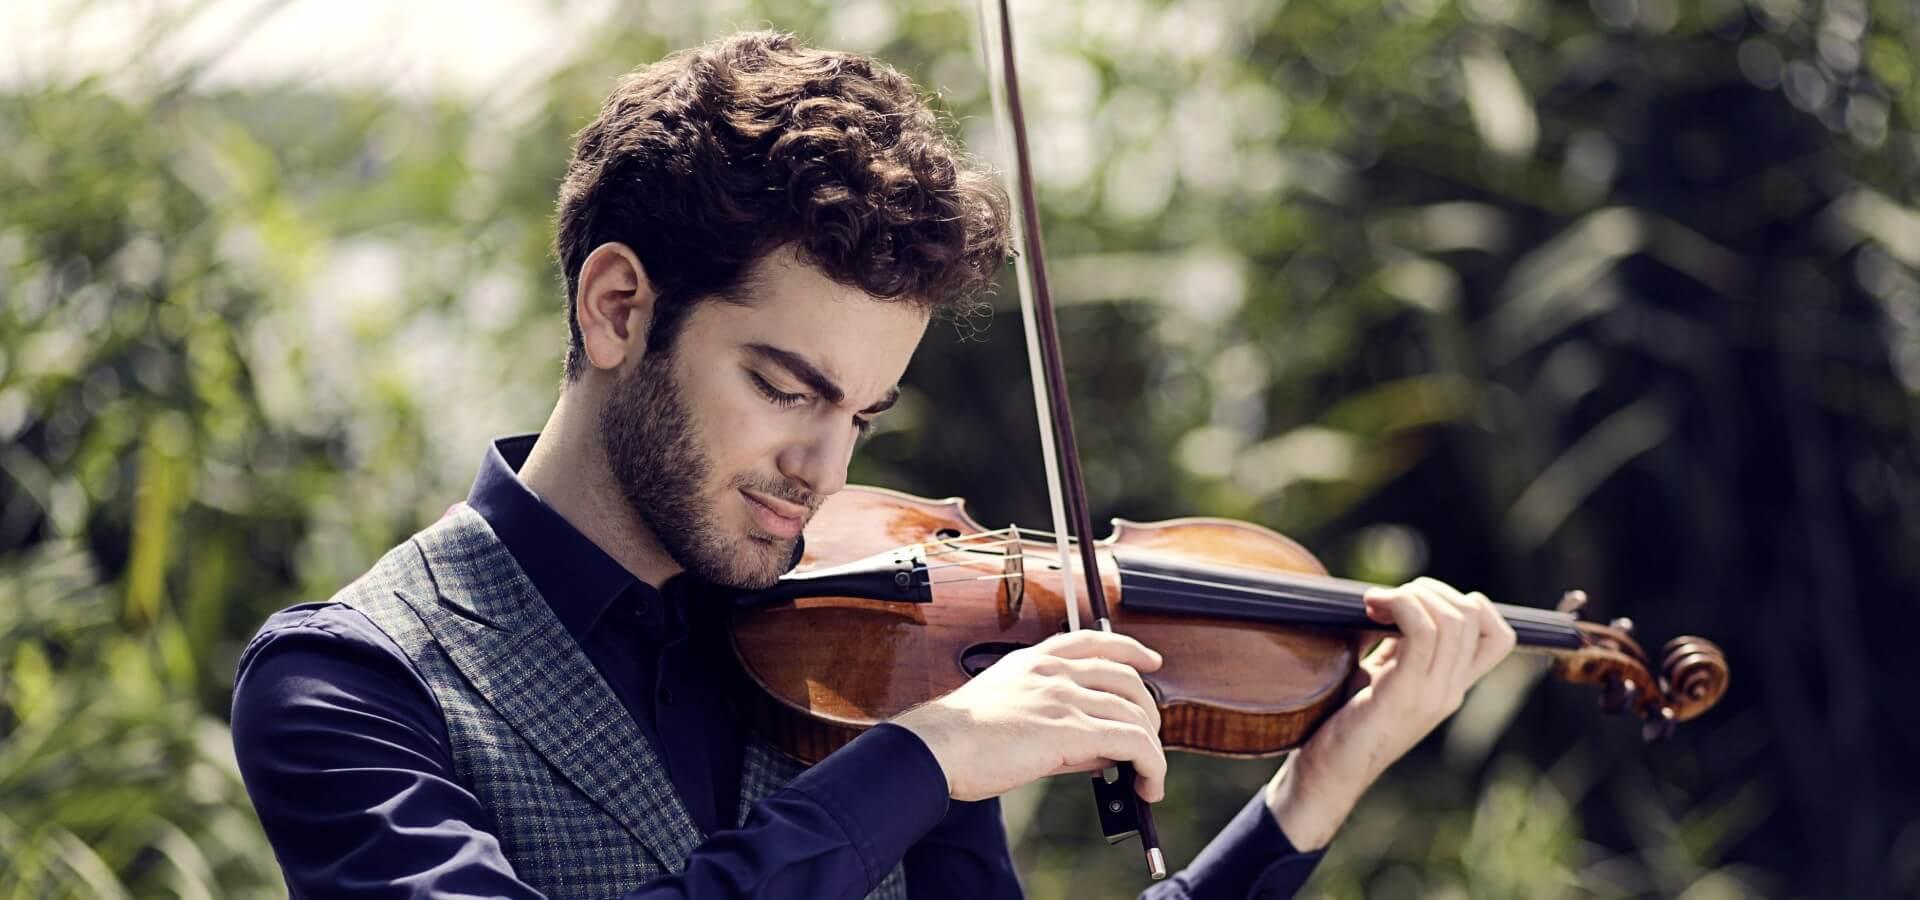 Symfonieorkest van Vlaanderen & Beethoven